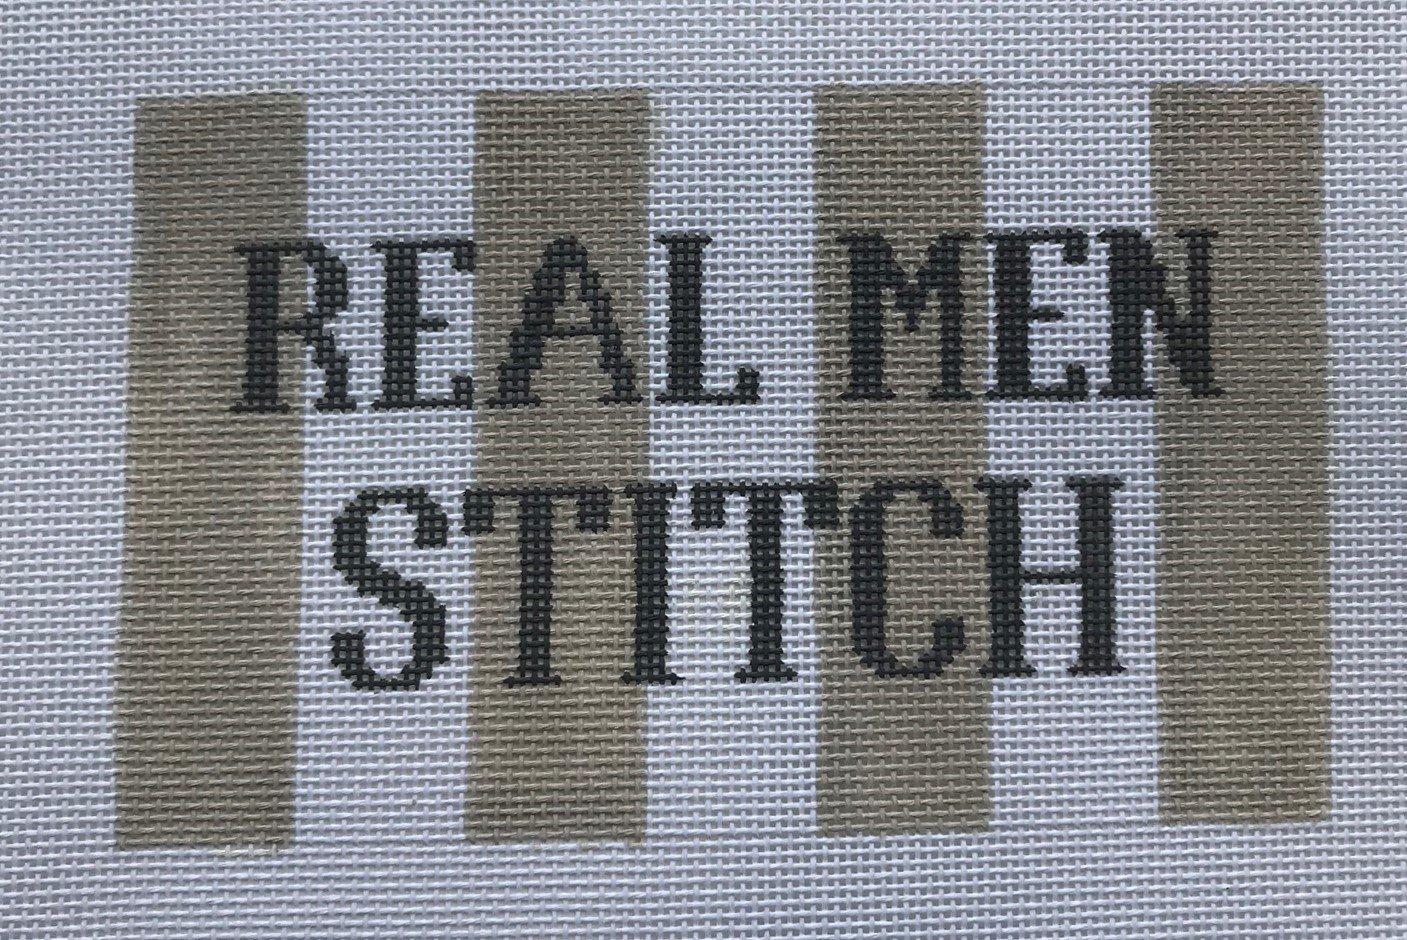 J&C/RM311 Real Men Stitch